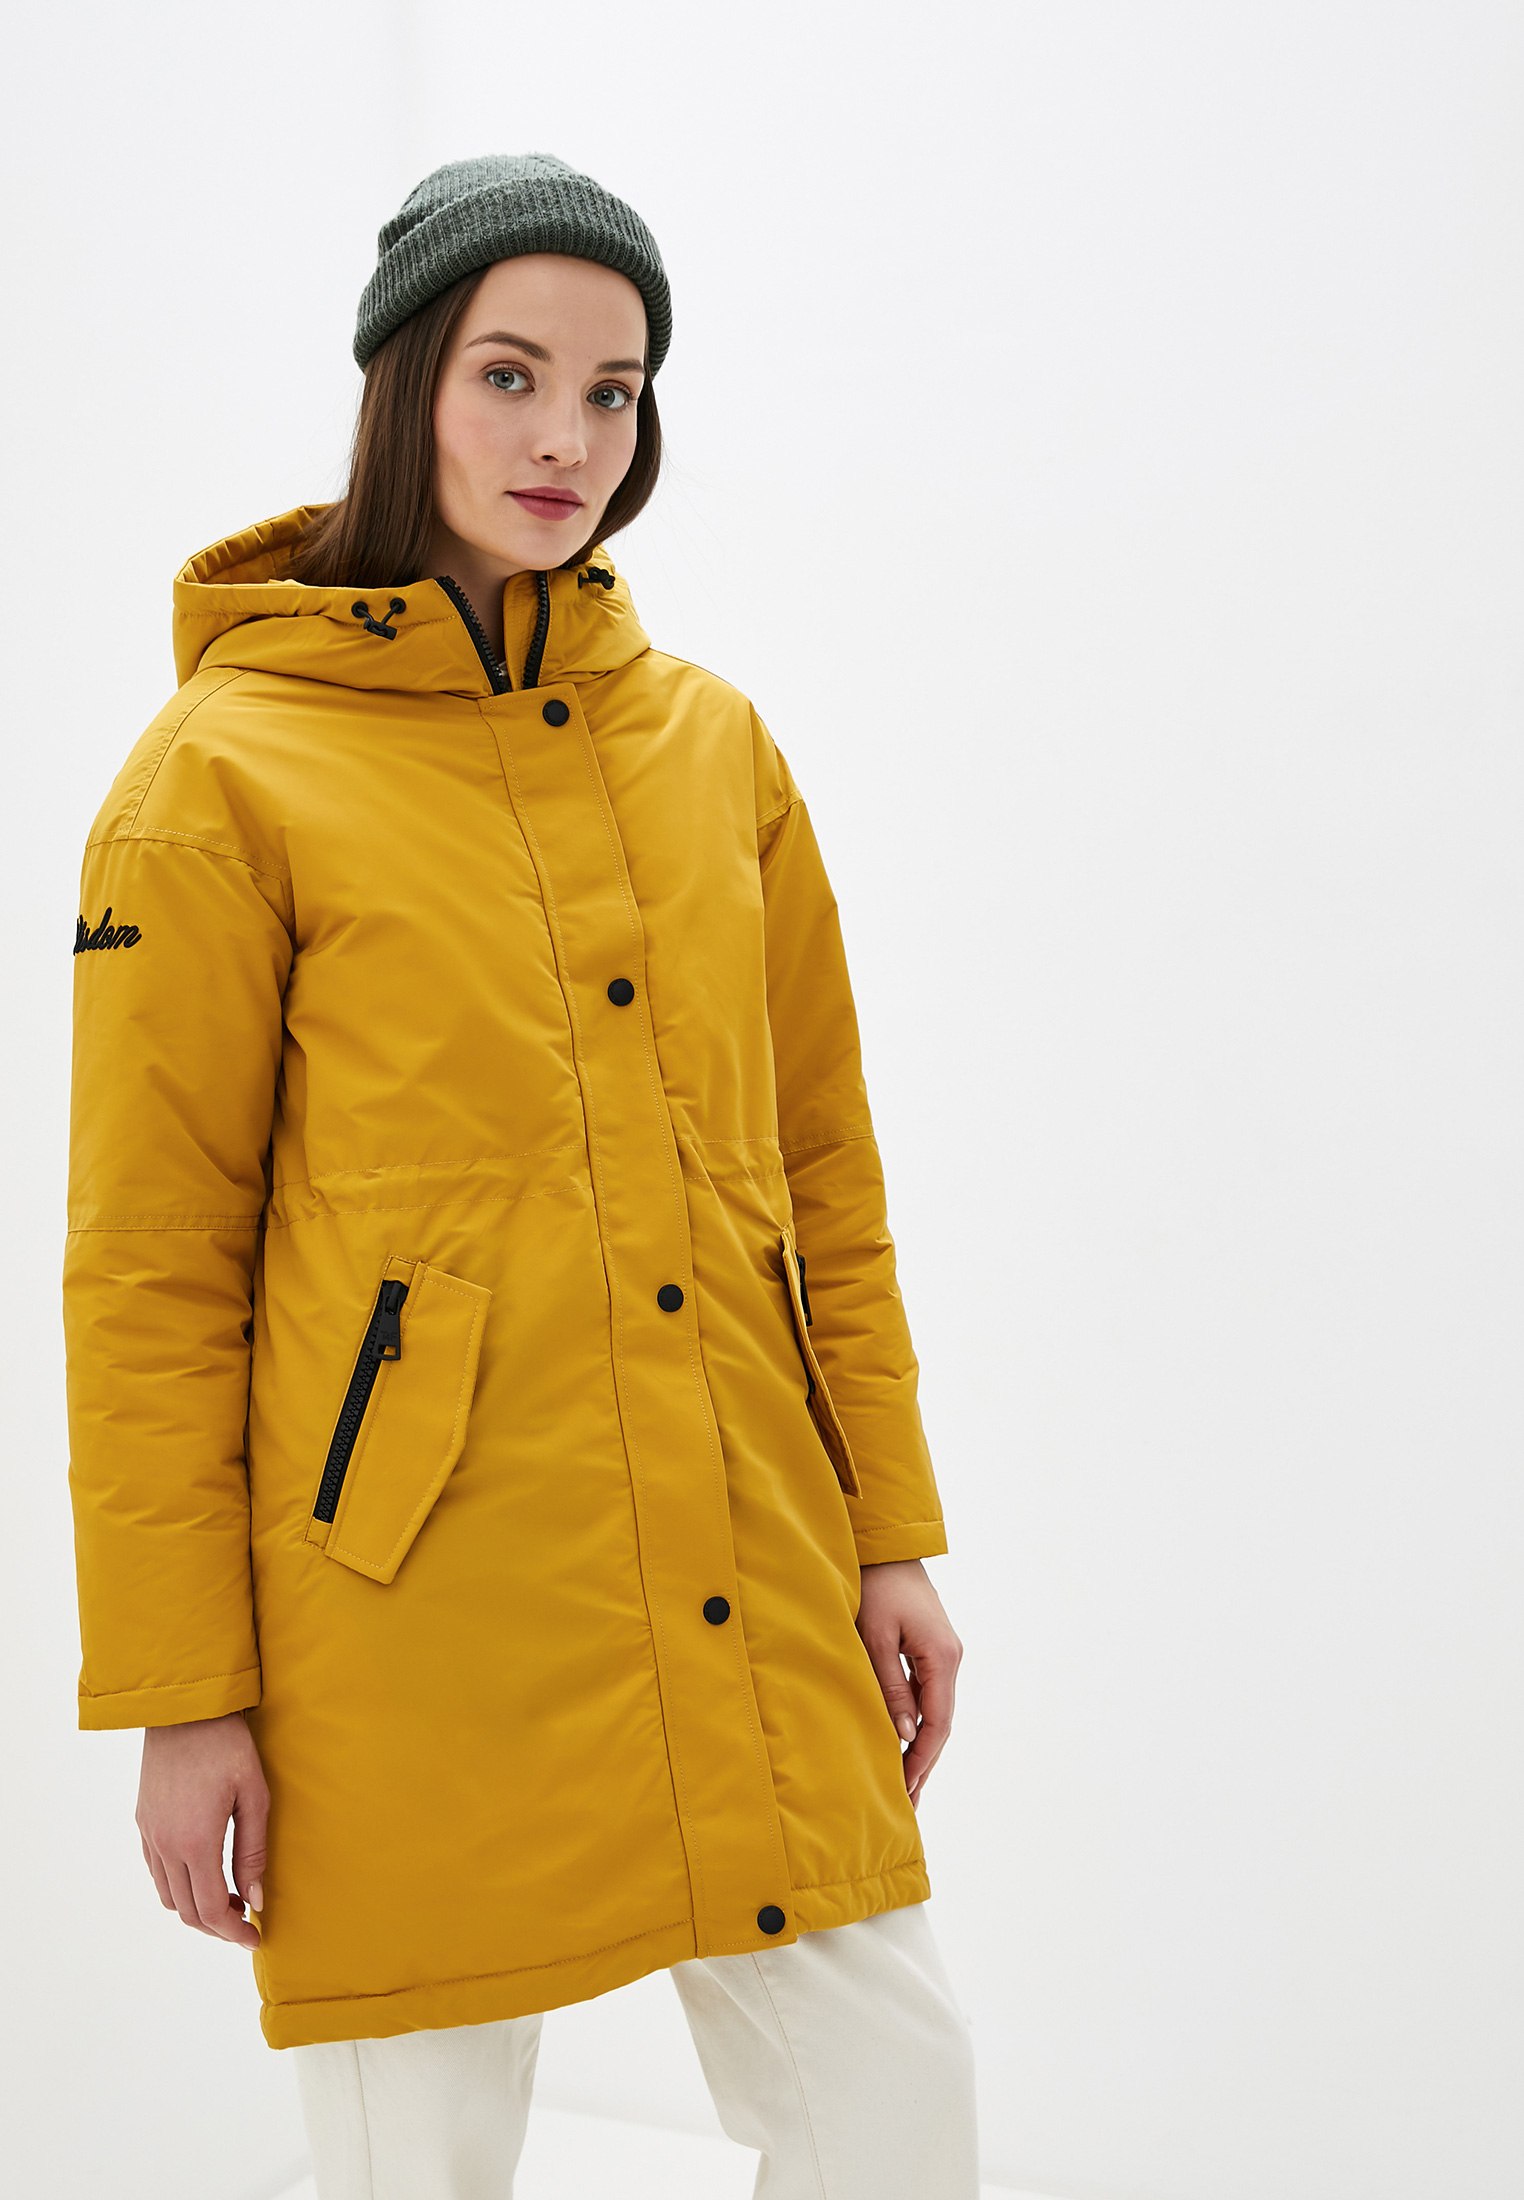 Парка, Tom Farr, цвет: желтый. Артикул: MP002XW1GEHX. Одежда / Верхняя одежда